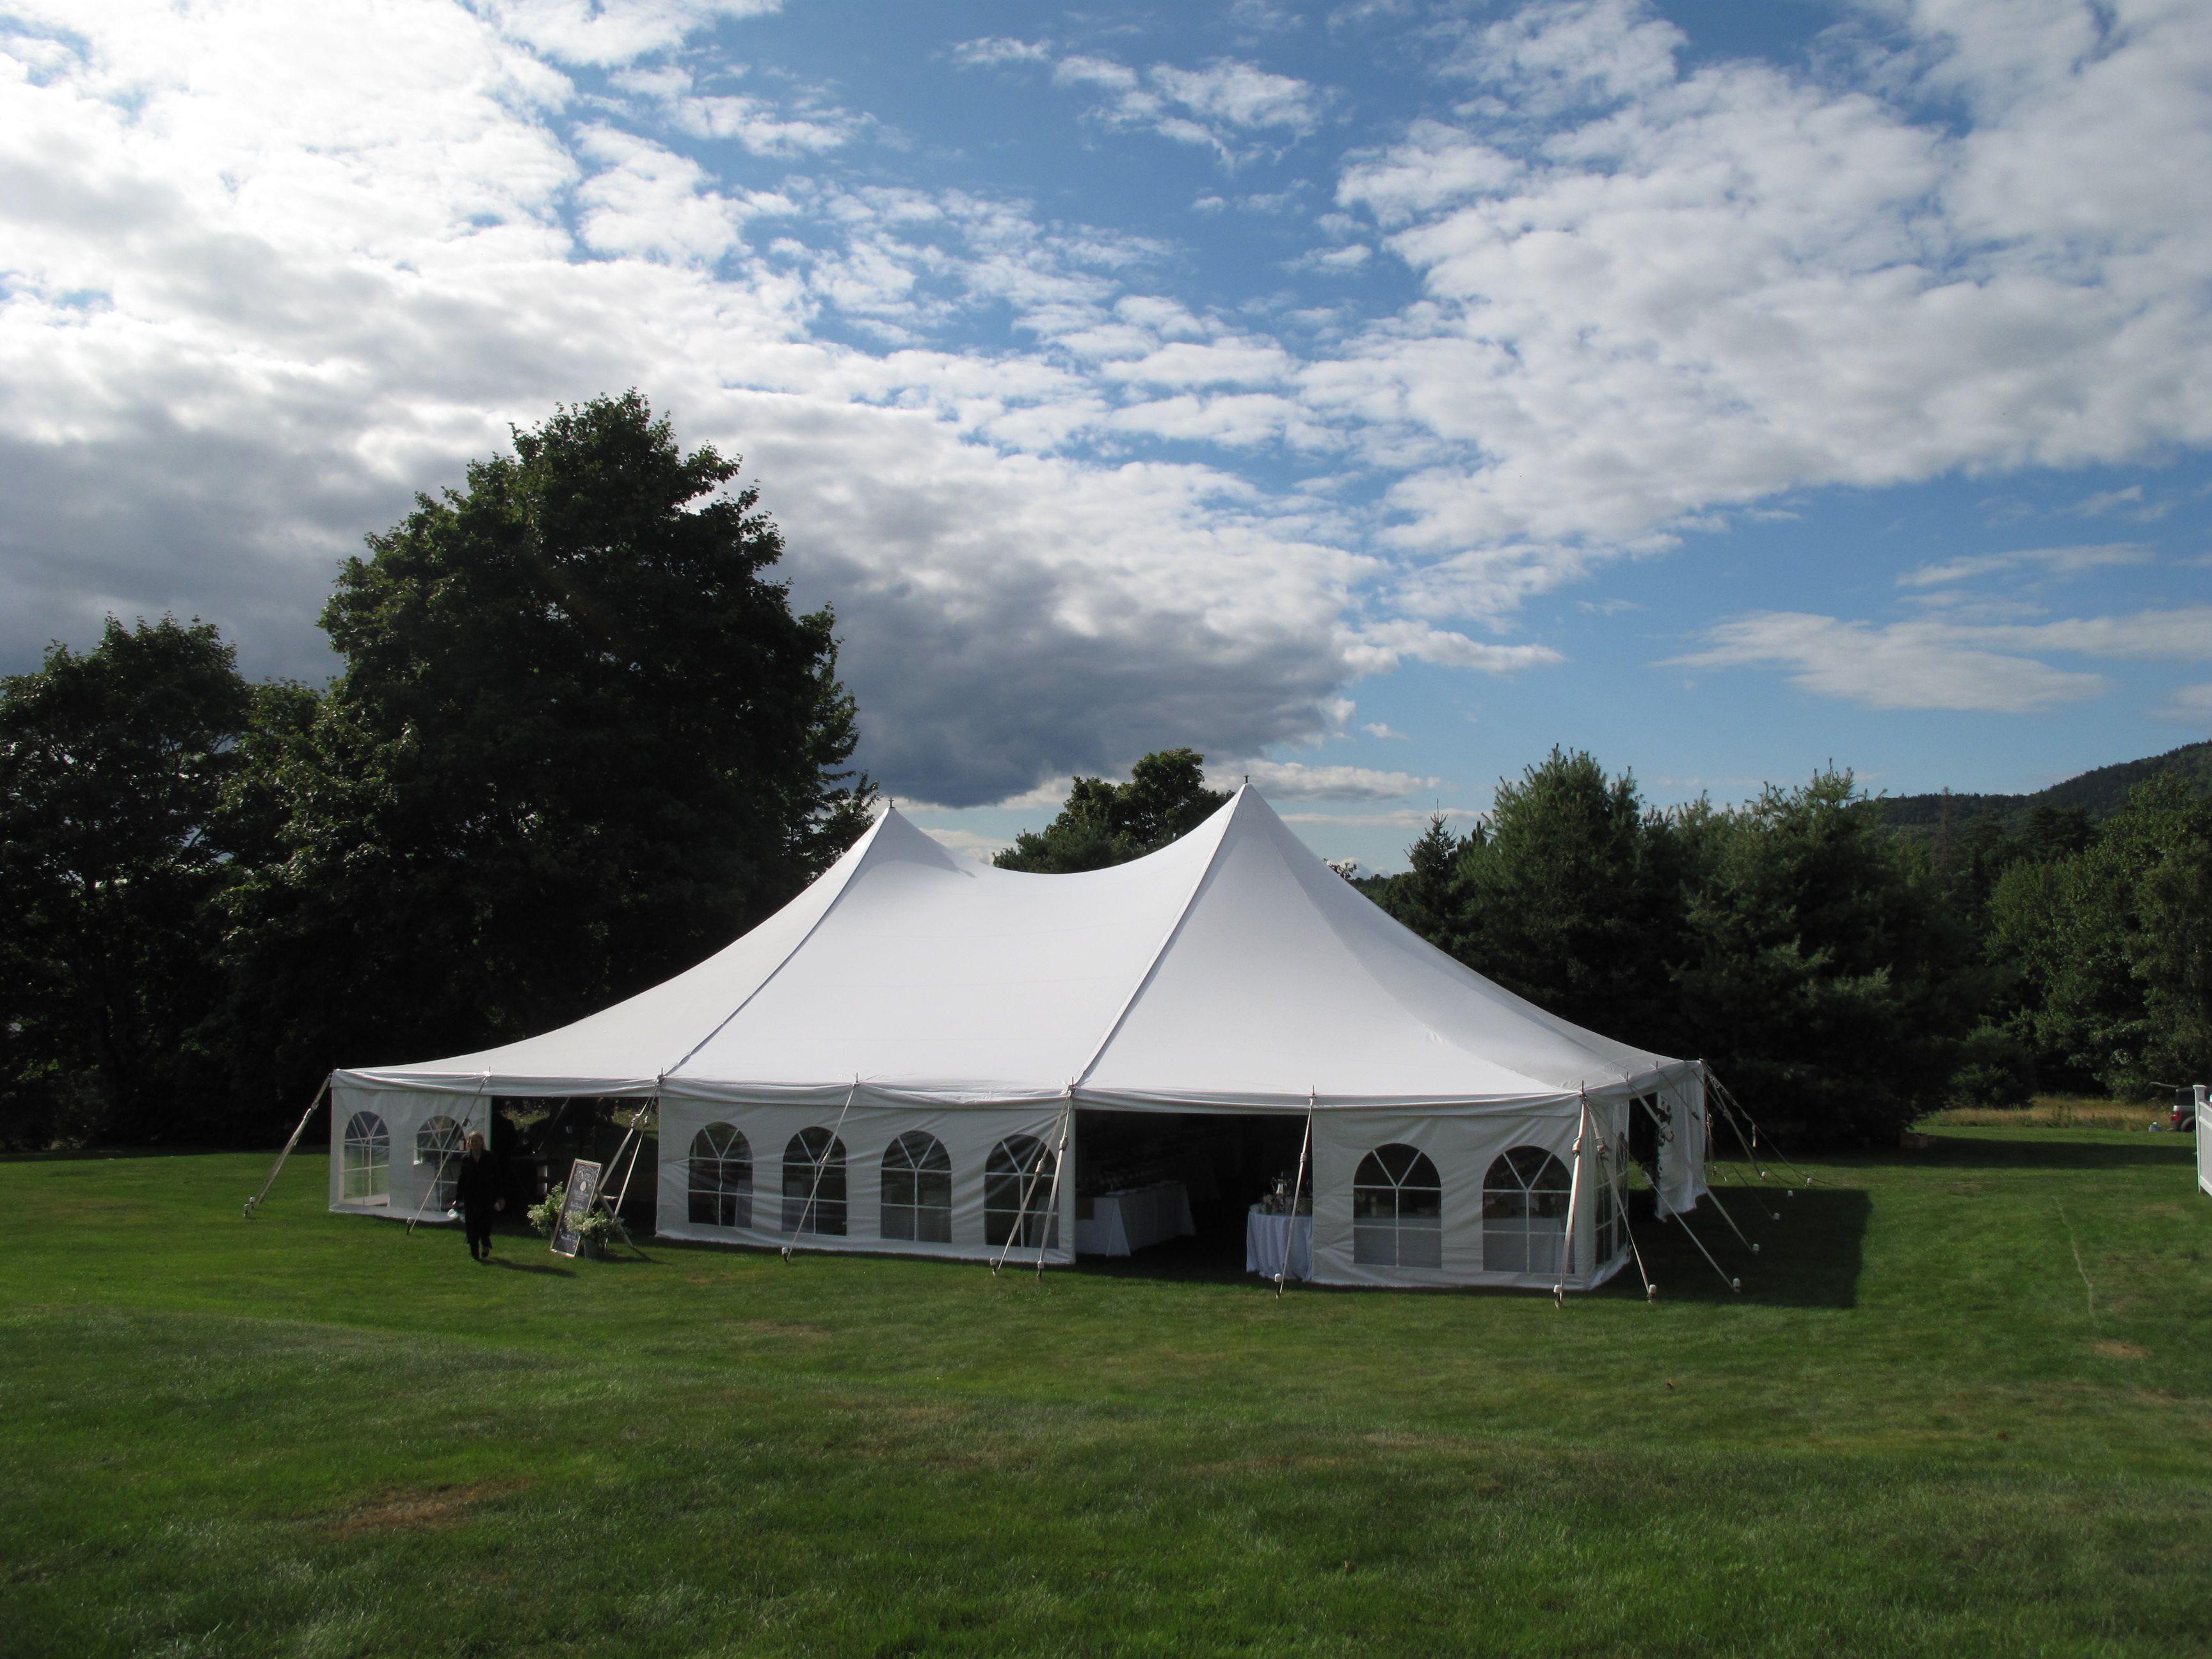 Wallace Tents 60 x 90 & Wallace Tents 60 x 90 | John Peters Estate | Pinterest | John peter